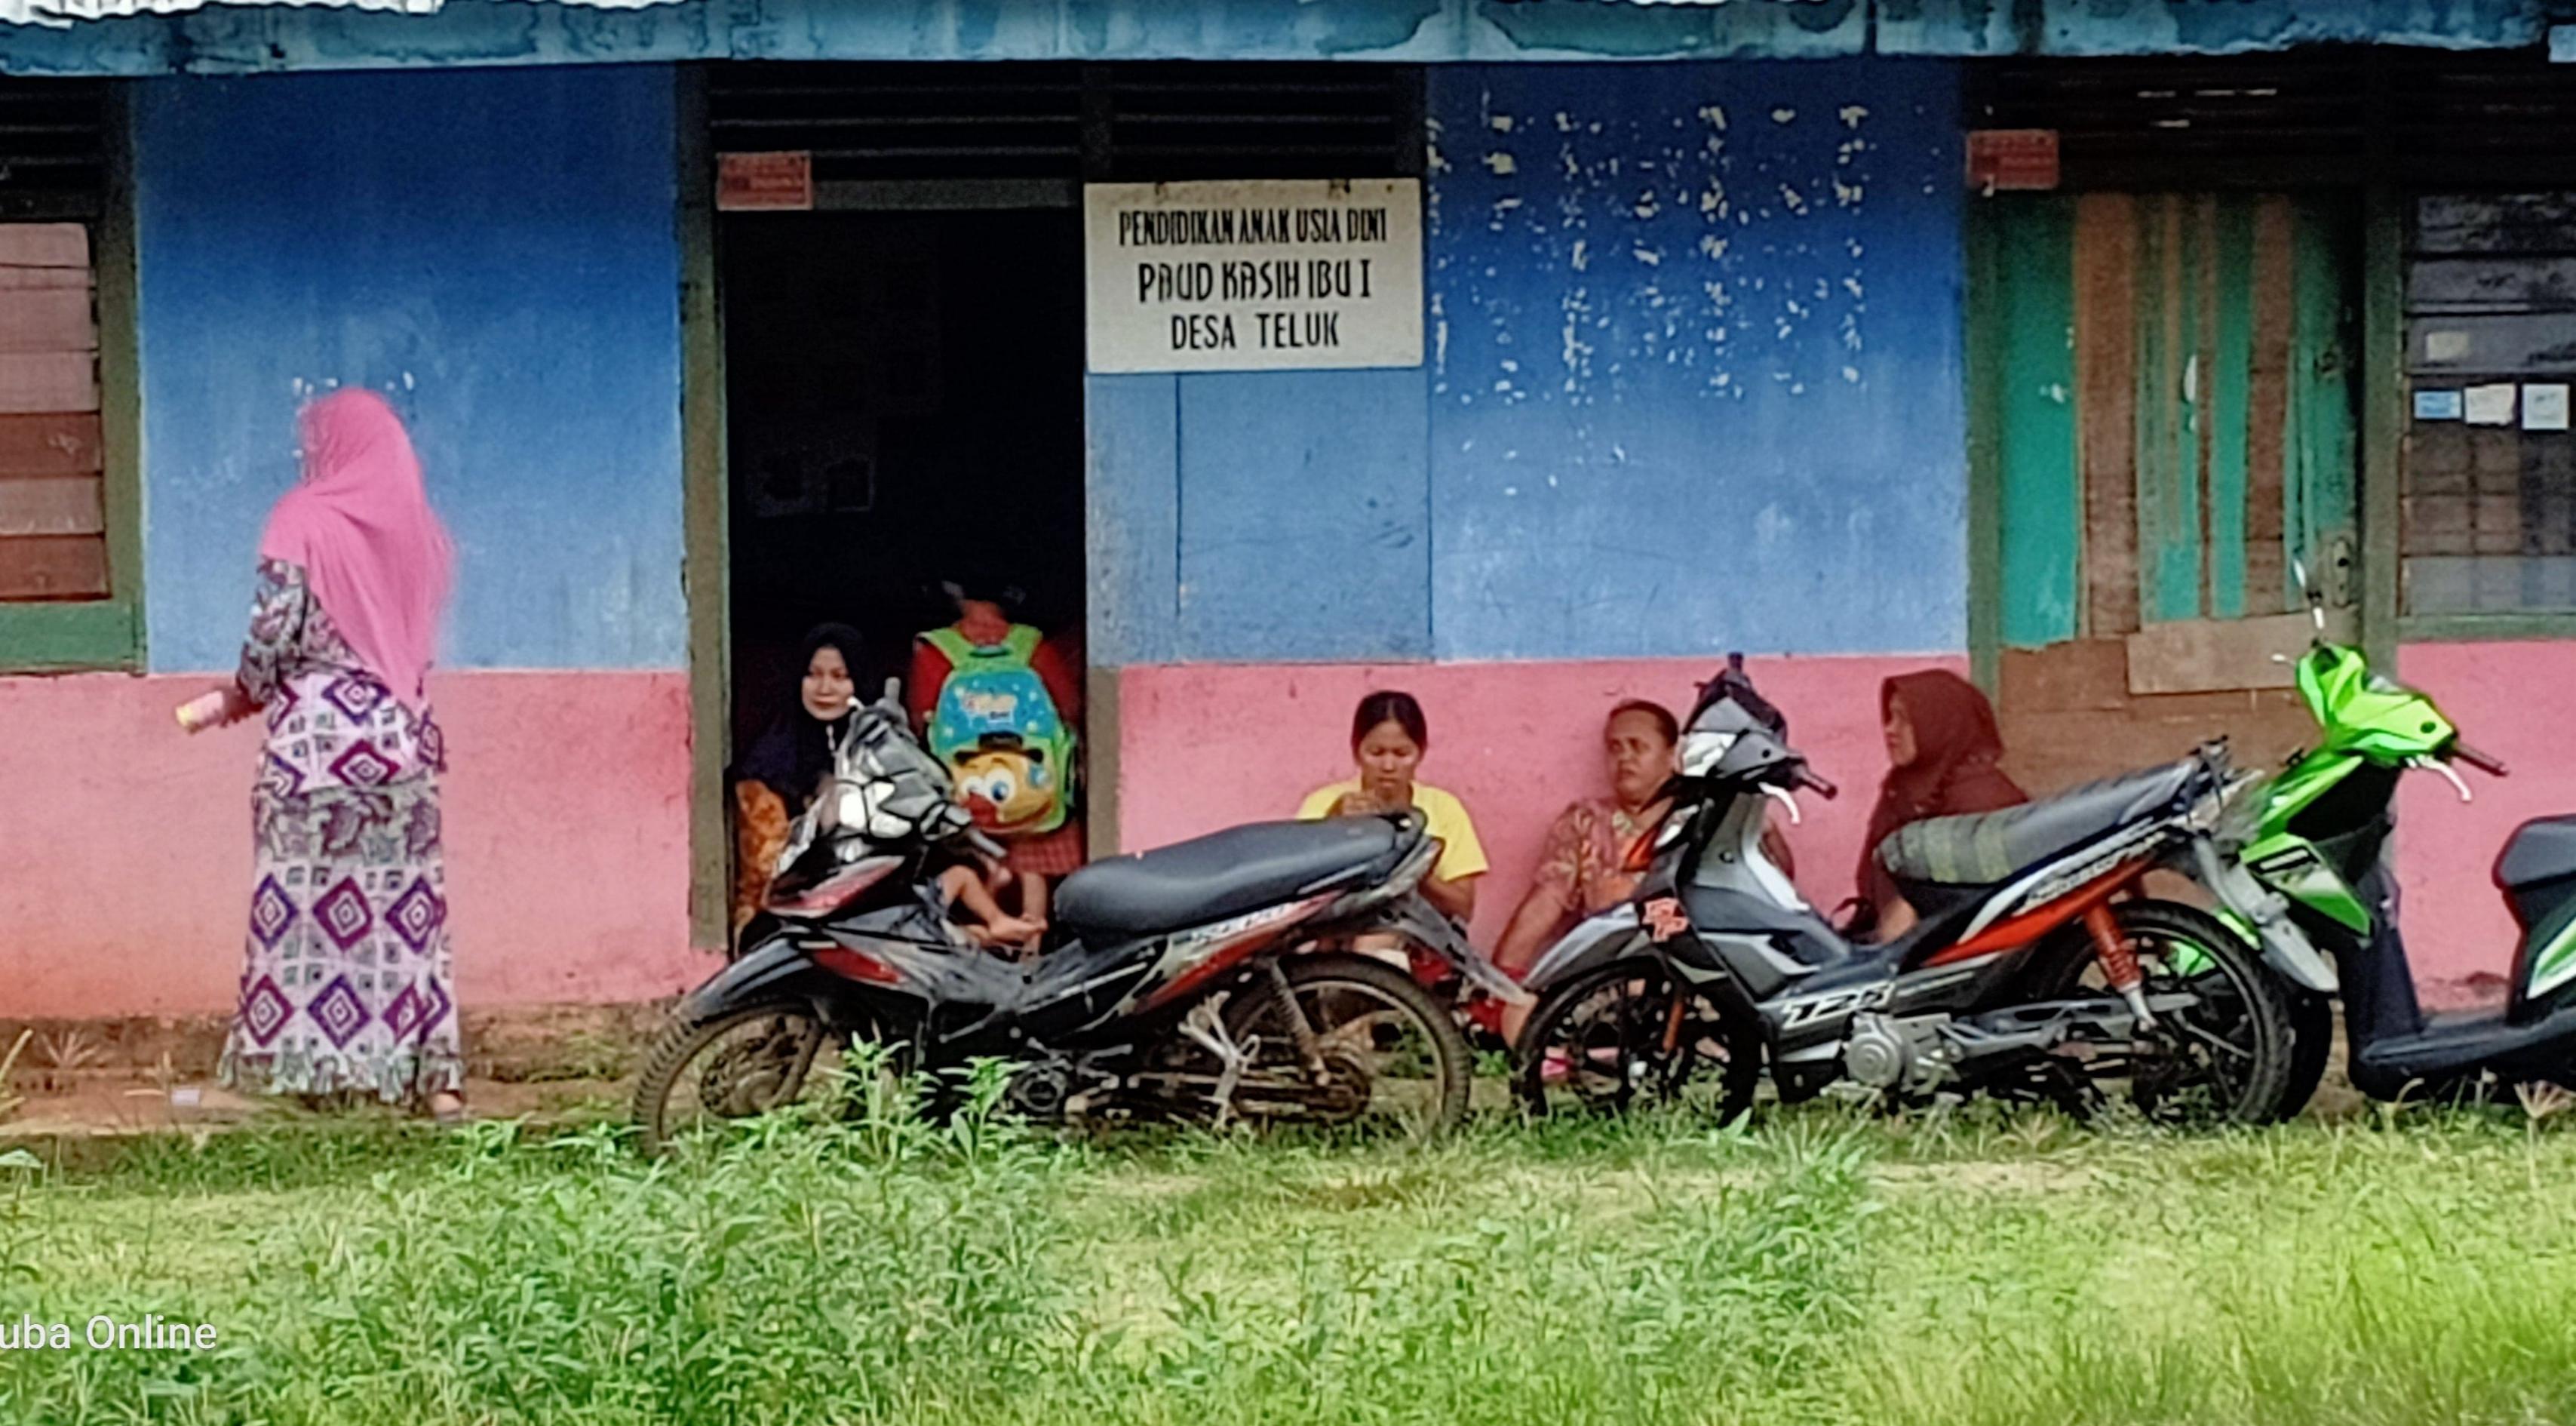 delapan-tahun-berdiri-paud-kasih-ibu-1-desa-teluk-tidak-punya-gedung-sendiri-muba218ak1578402795.jpg